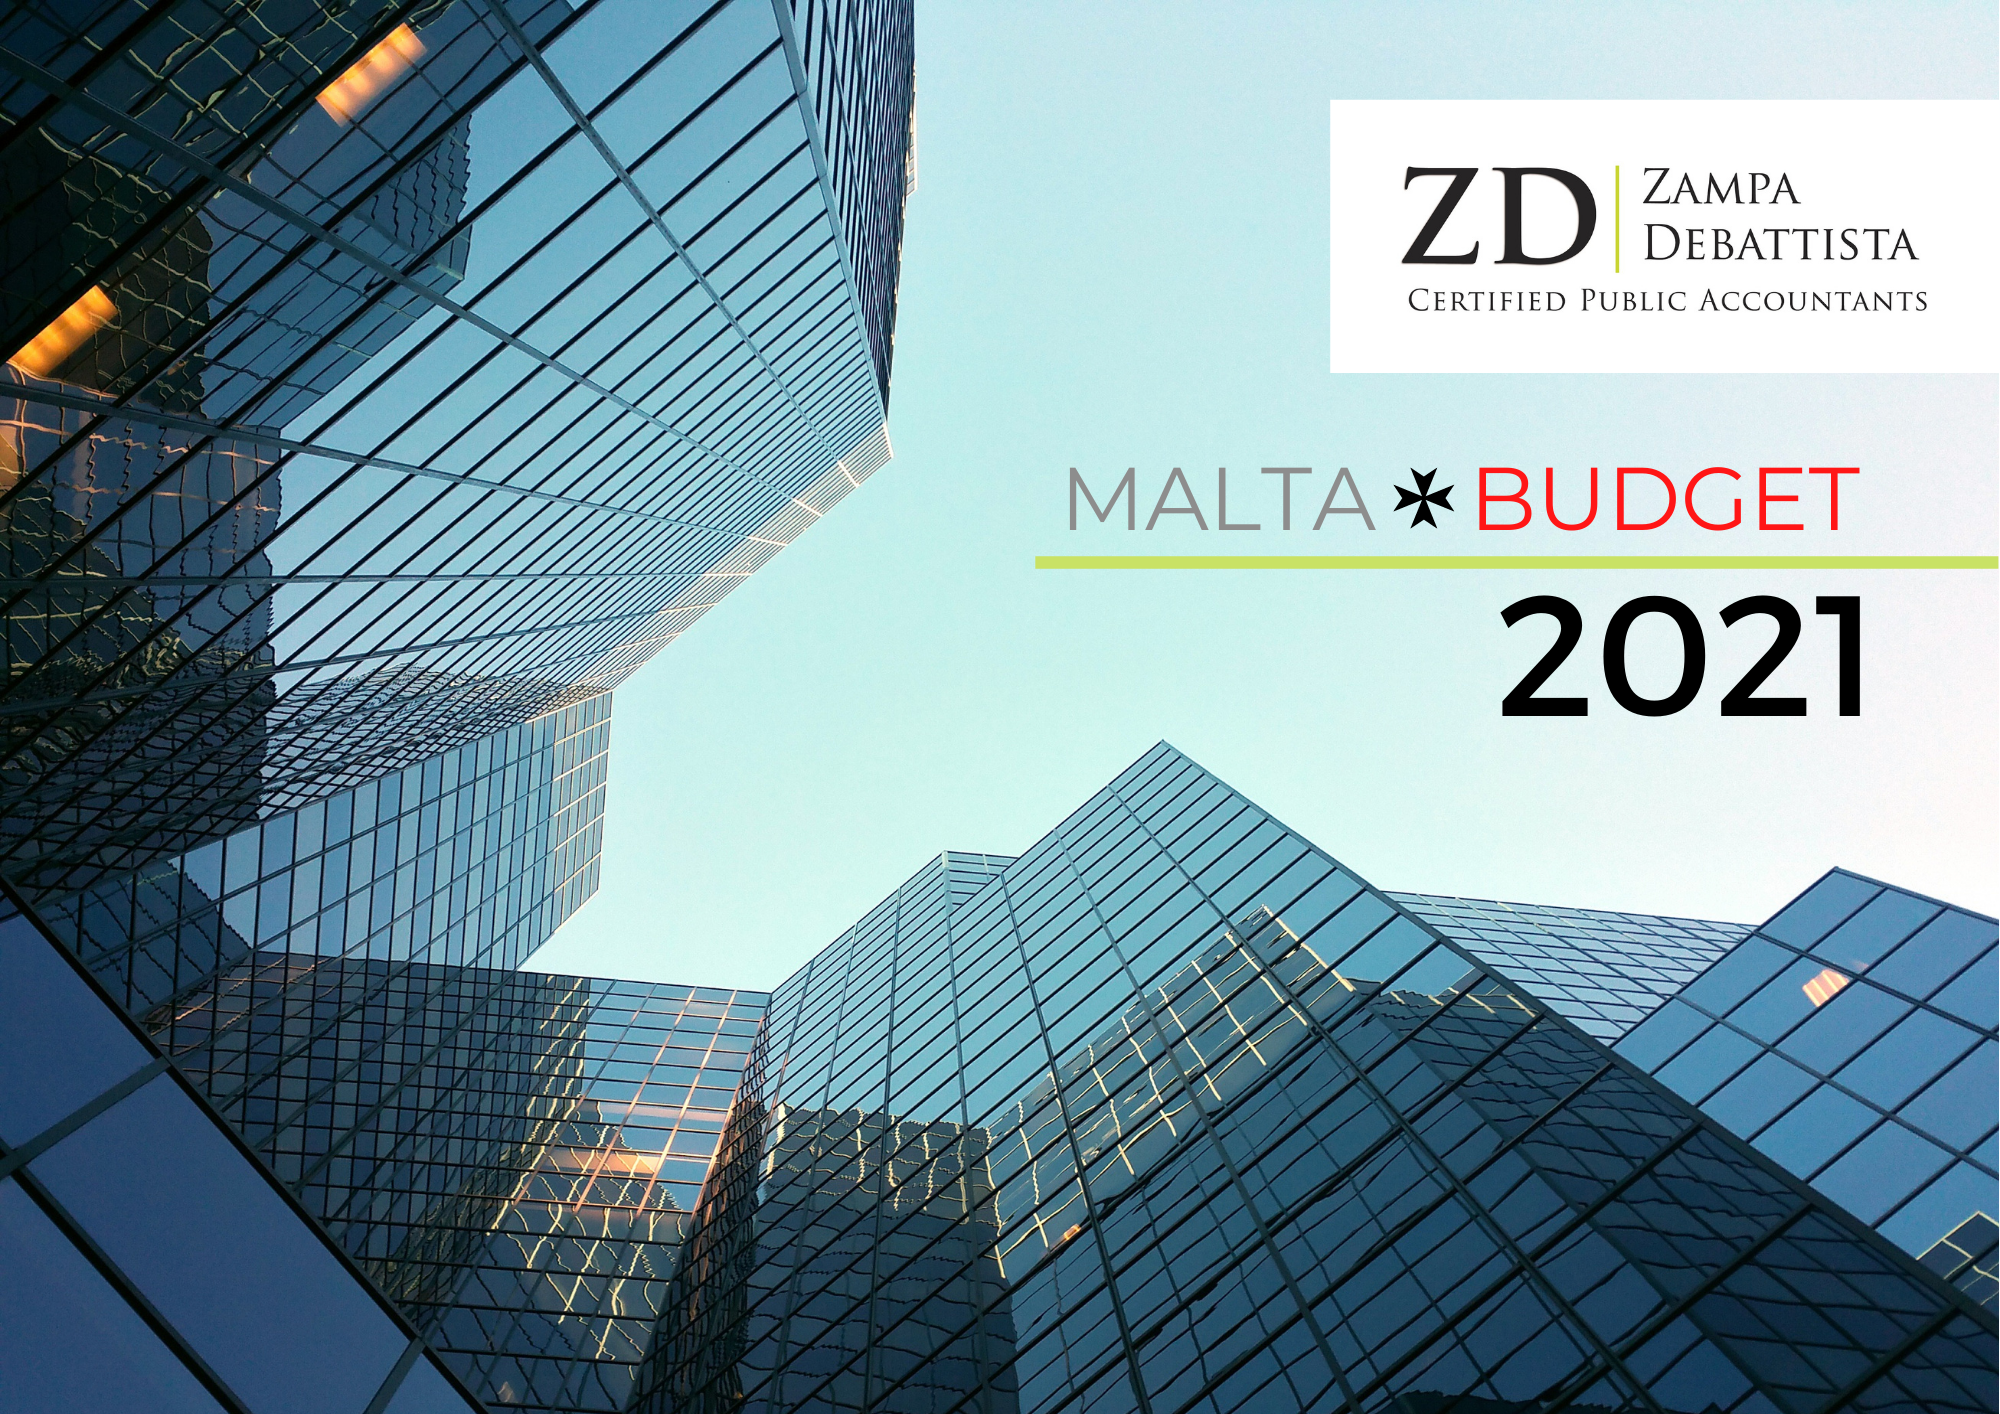 Malta Budget 2021: Key Takeaways